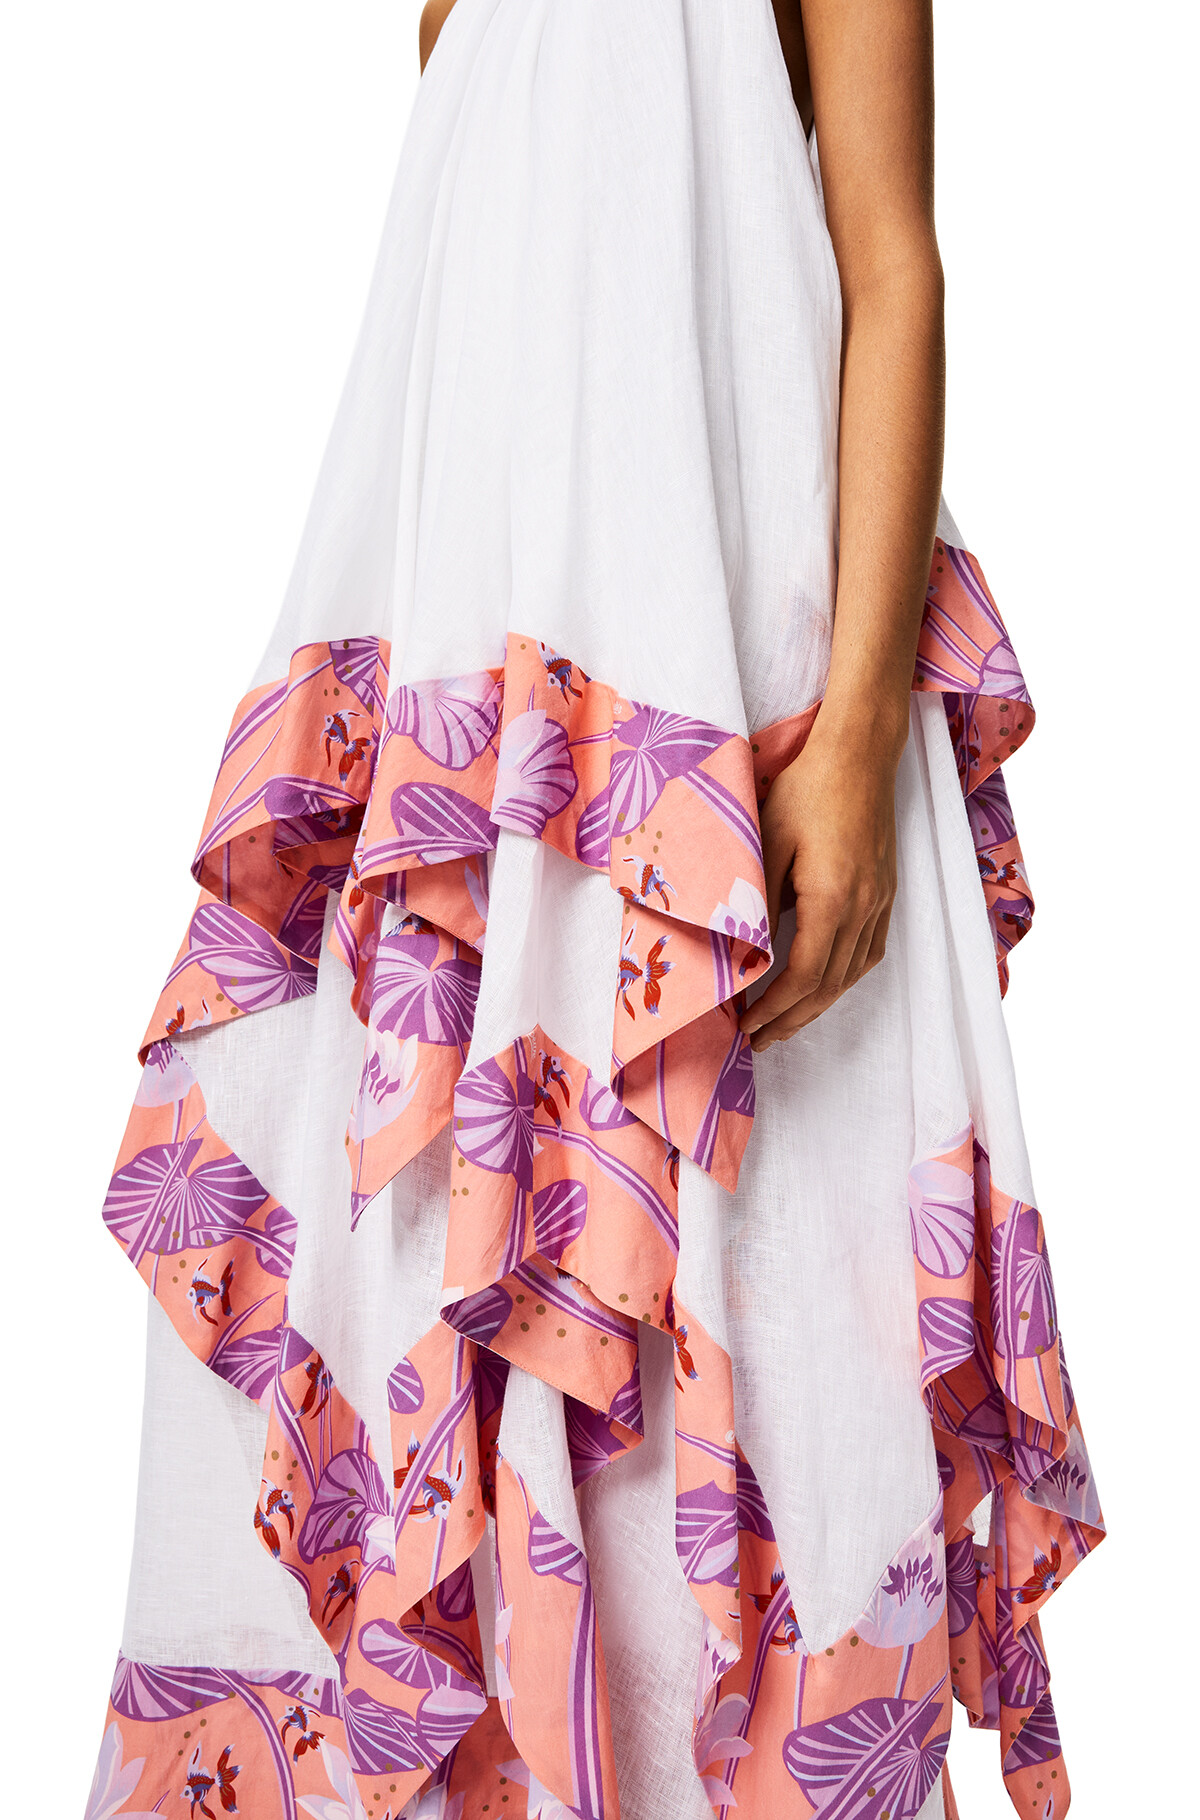 LOEWE Halterneck Tier Dress In Linen Salmon/White front